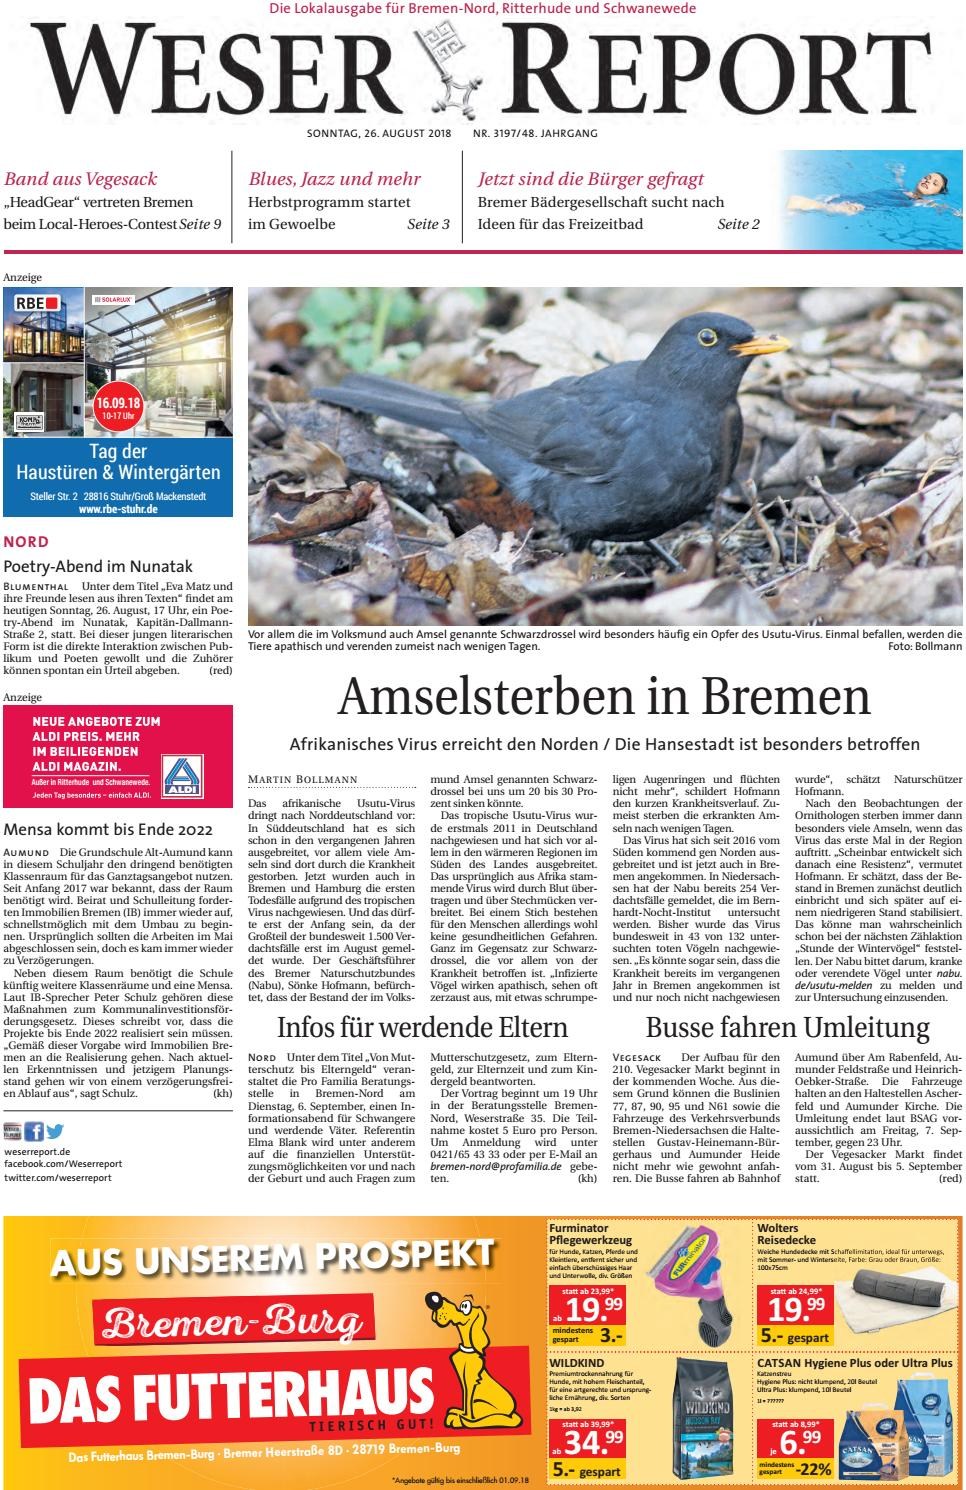 Weser Report - Nord Vom 26.08.2018 By Kps Verlagsgesellschaft Mbh